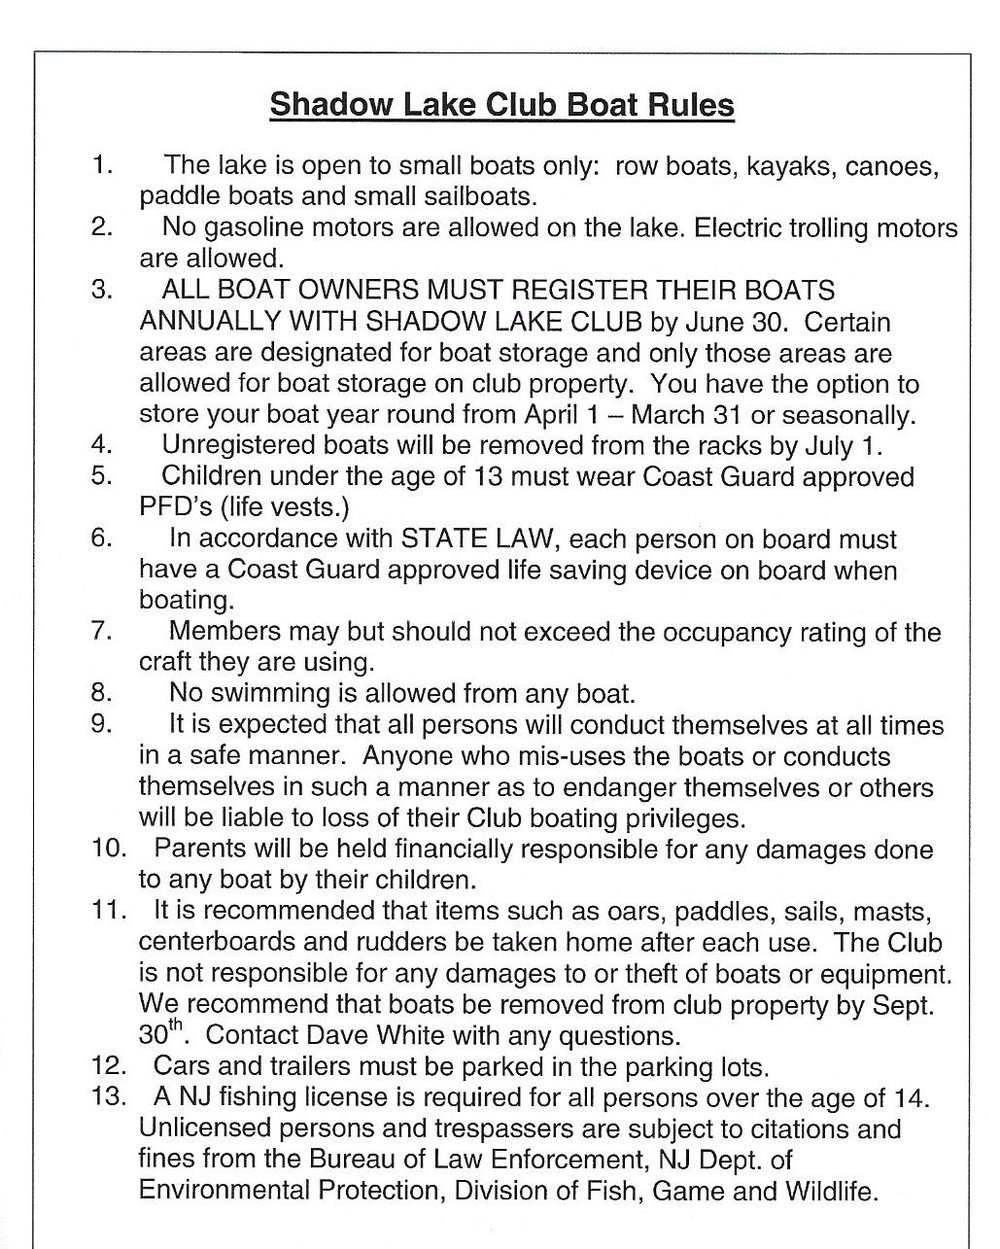 Boat rules.jpg